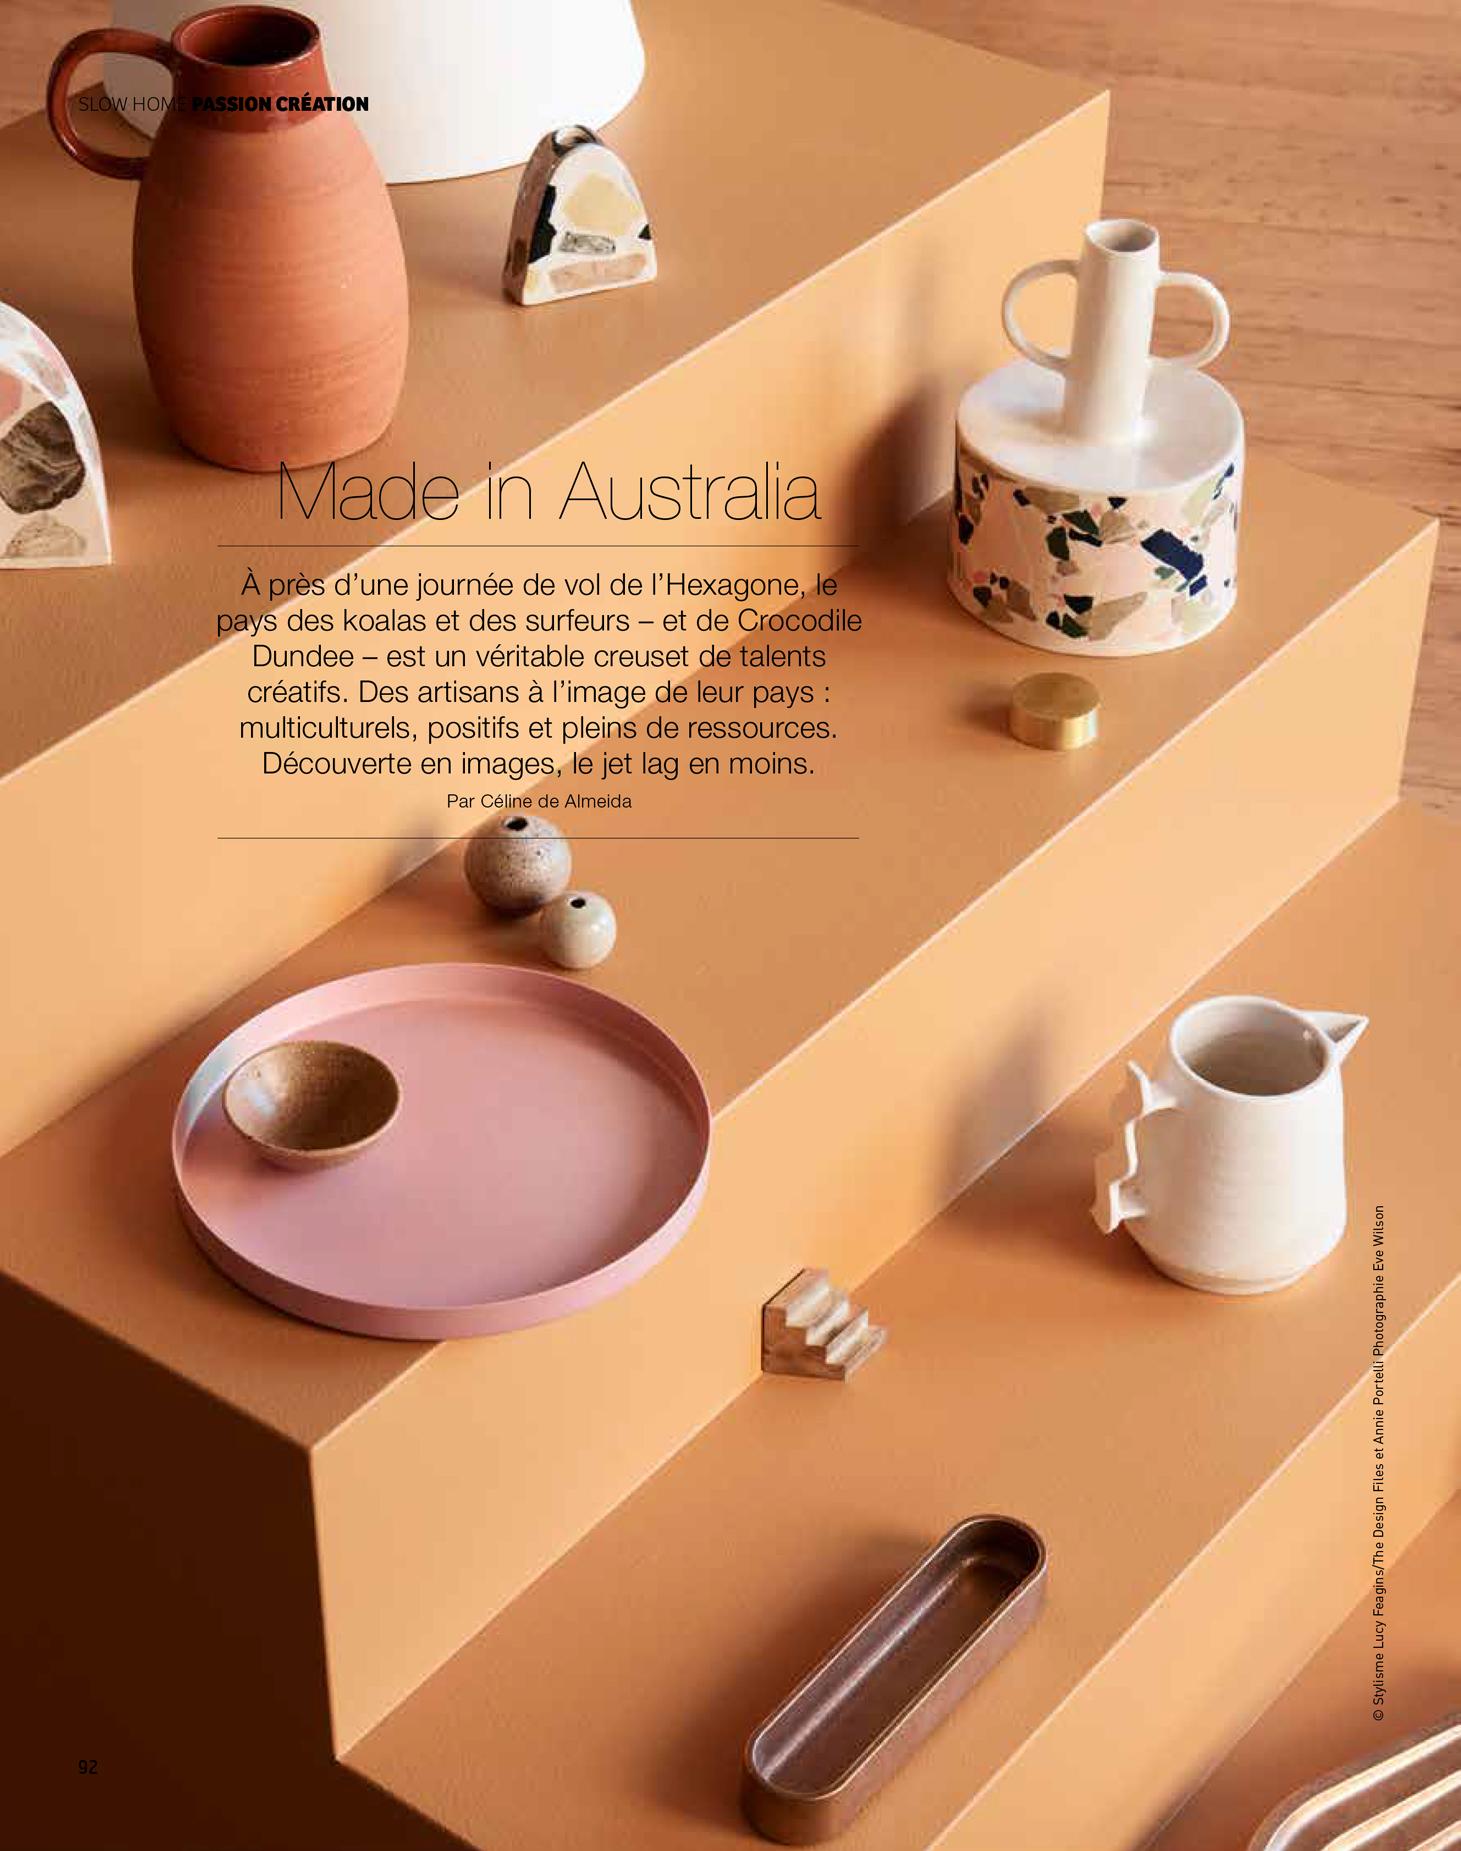 Erin+malloy+french_HOME+magazine+woodwork+woodworkerAVR18_1.jpg